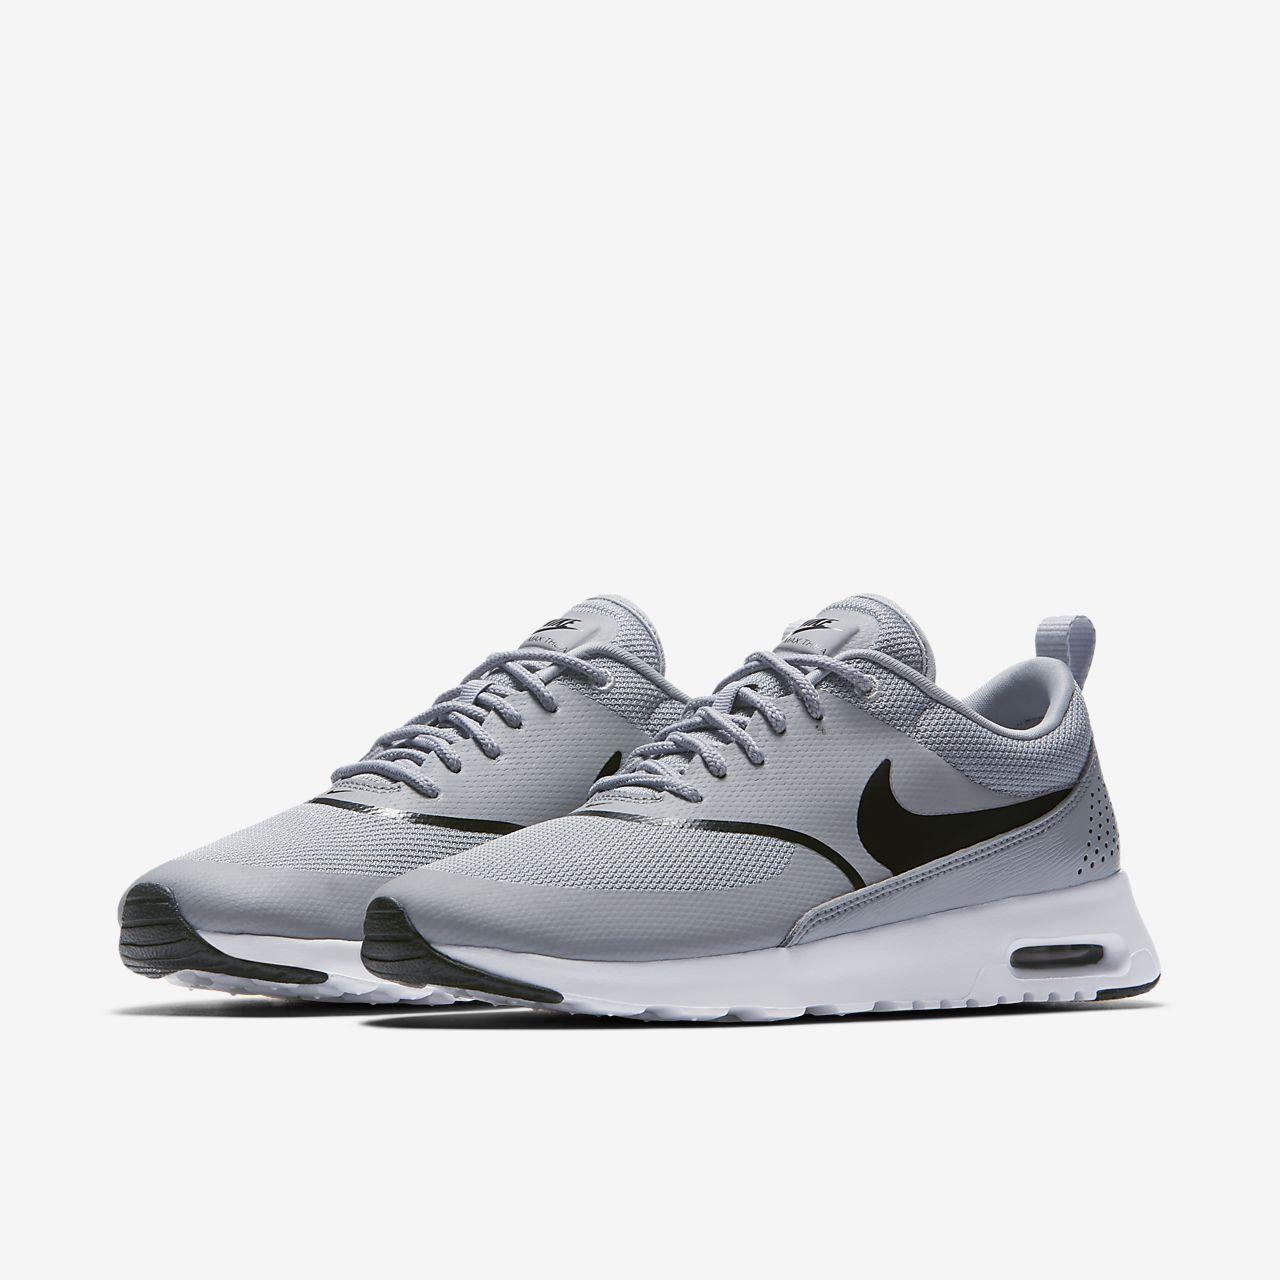 reputable site 7fadf 87fc6 ... Nike Air Max Thea Women s Shoe